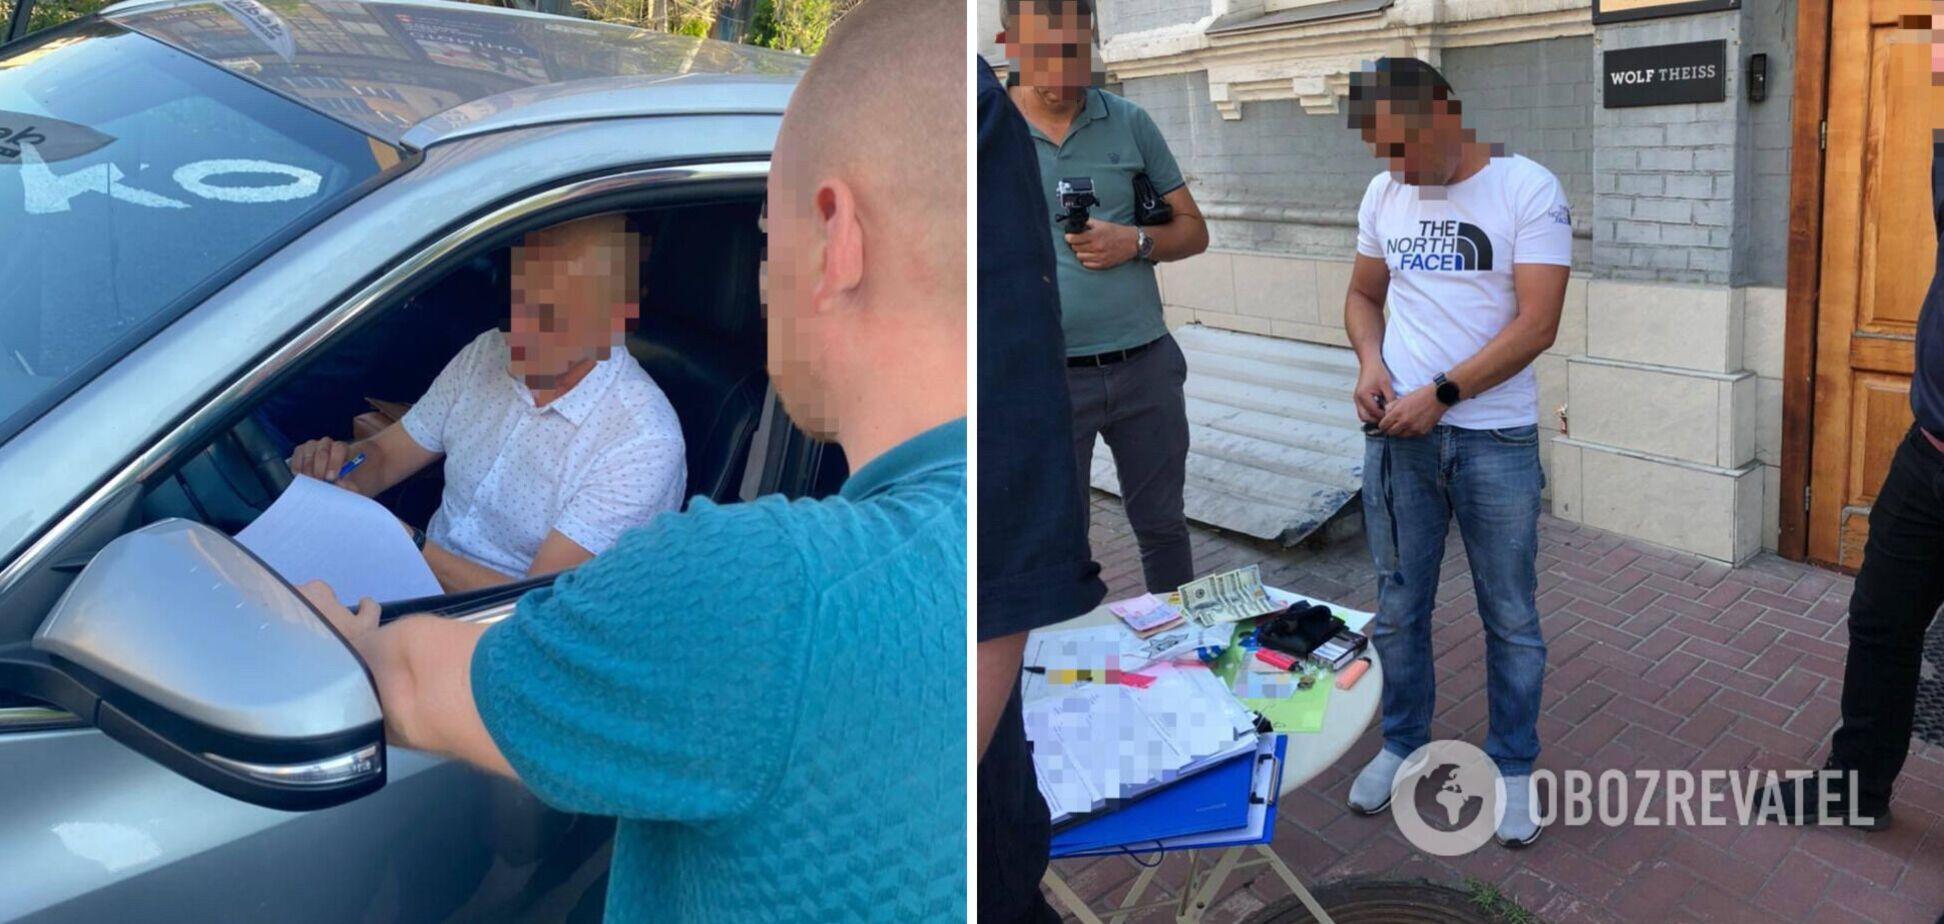 Гендиректора Реєстру судноплавства України затримали